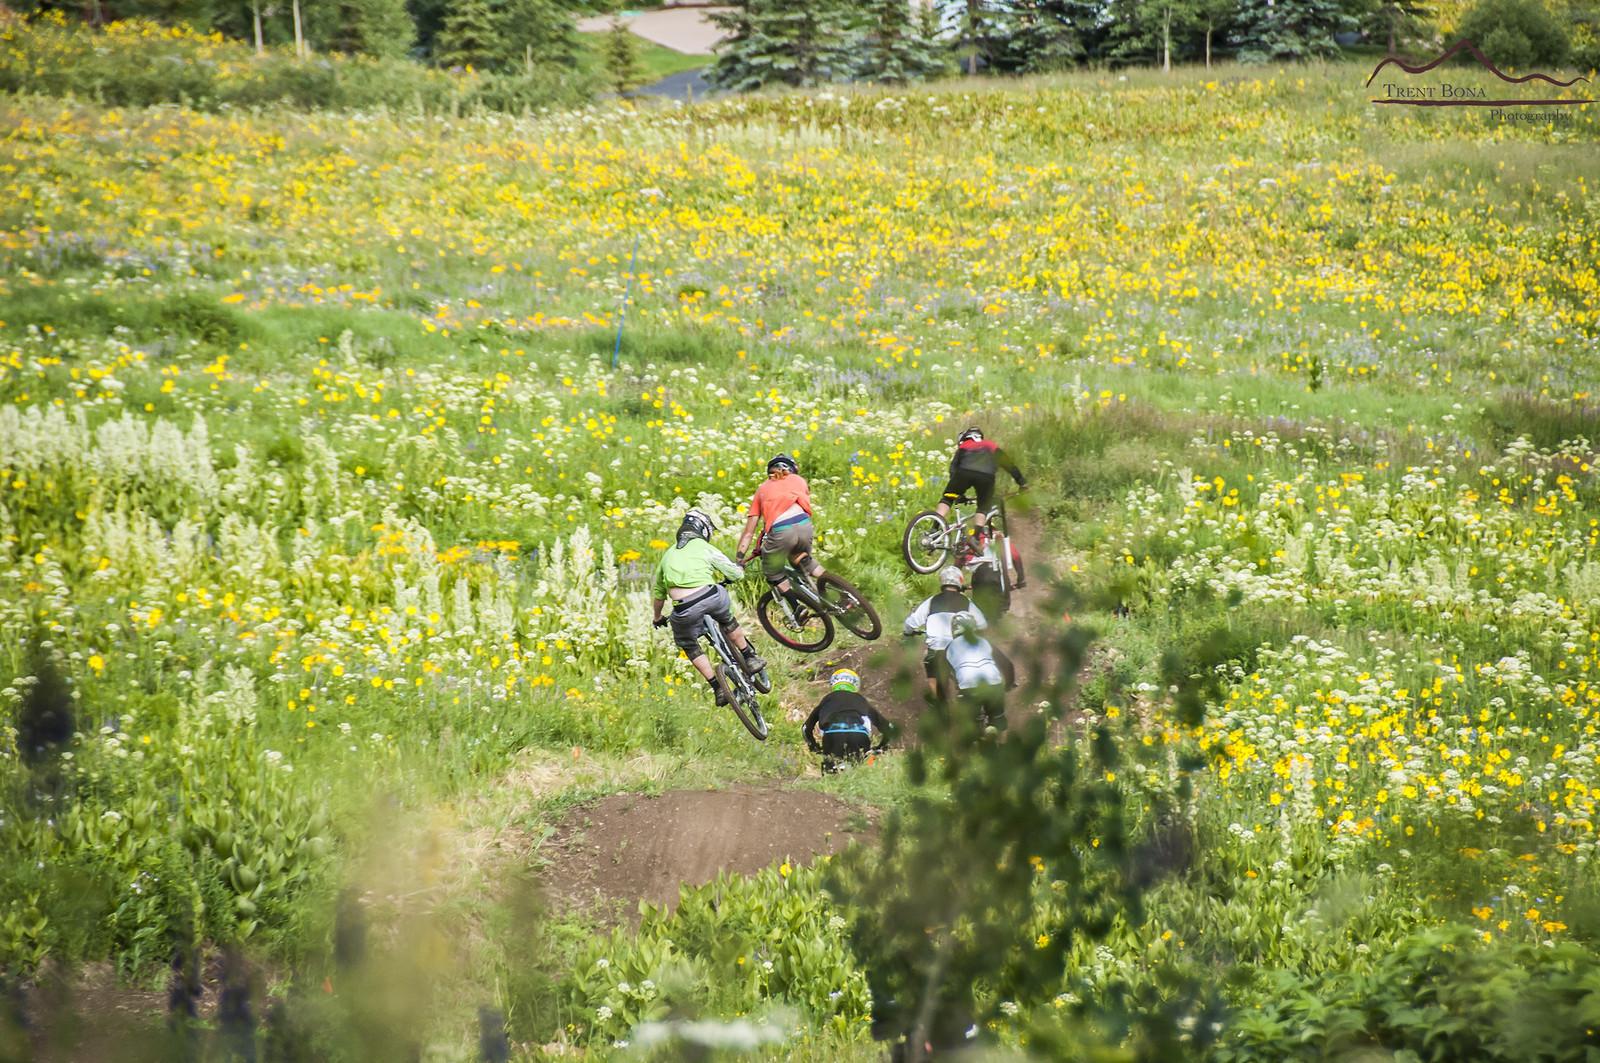 Train Sending It - Evolution Bike Park - Mountain Biking Pictures - Vital MTB